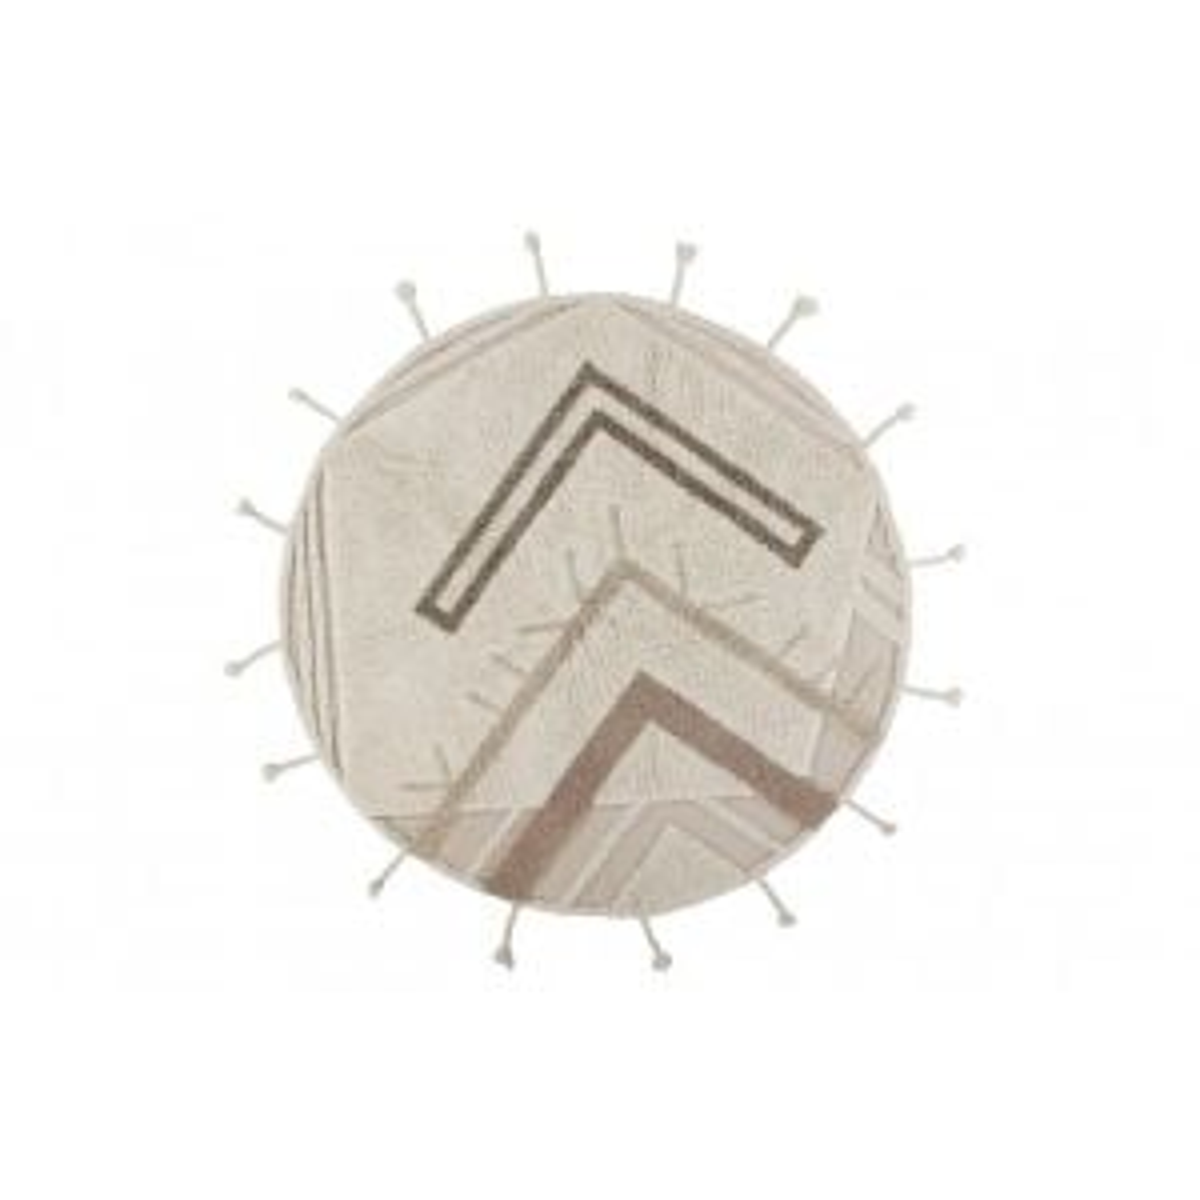 Dywan BANNOCK 160x160 beżowy/brązowy